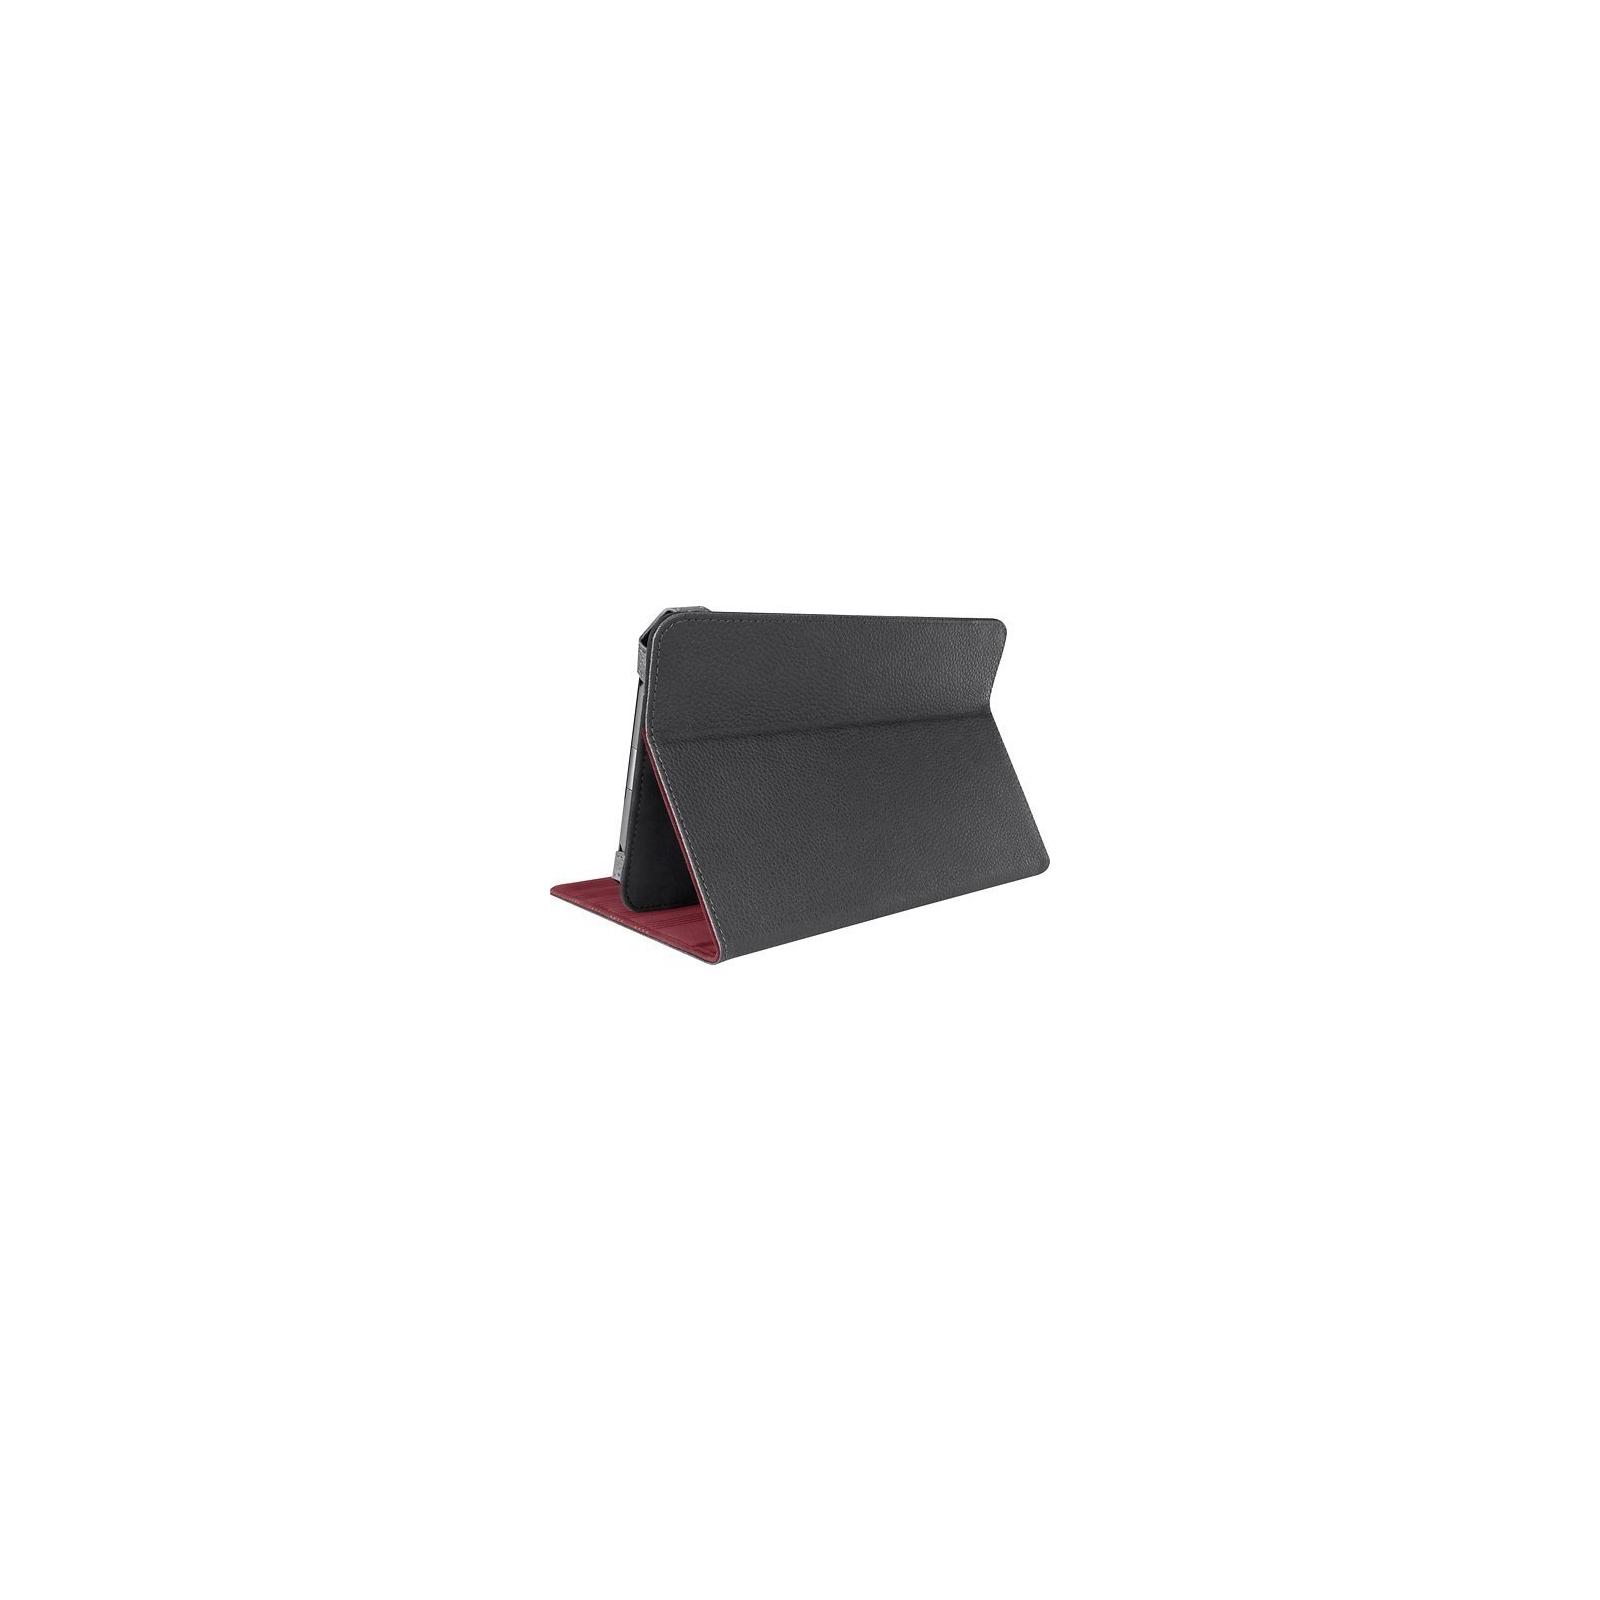 Чехол для планшета Belkin 7 Universal, Verve Tab Folio Stand black-red (F8N672ttC01)